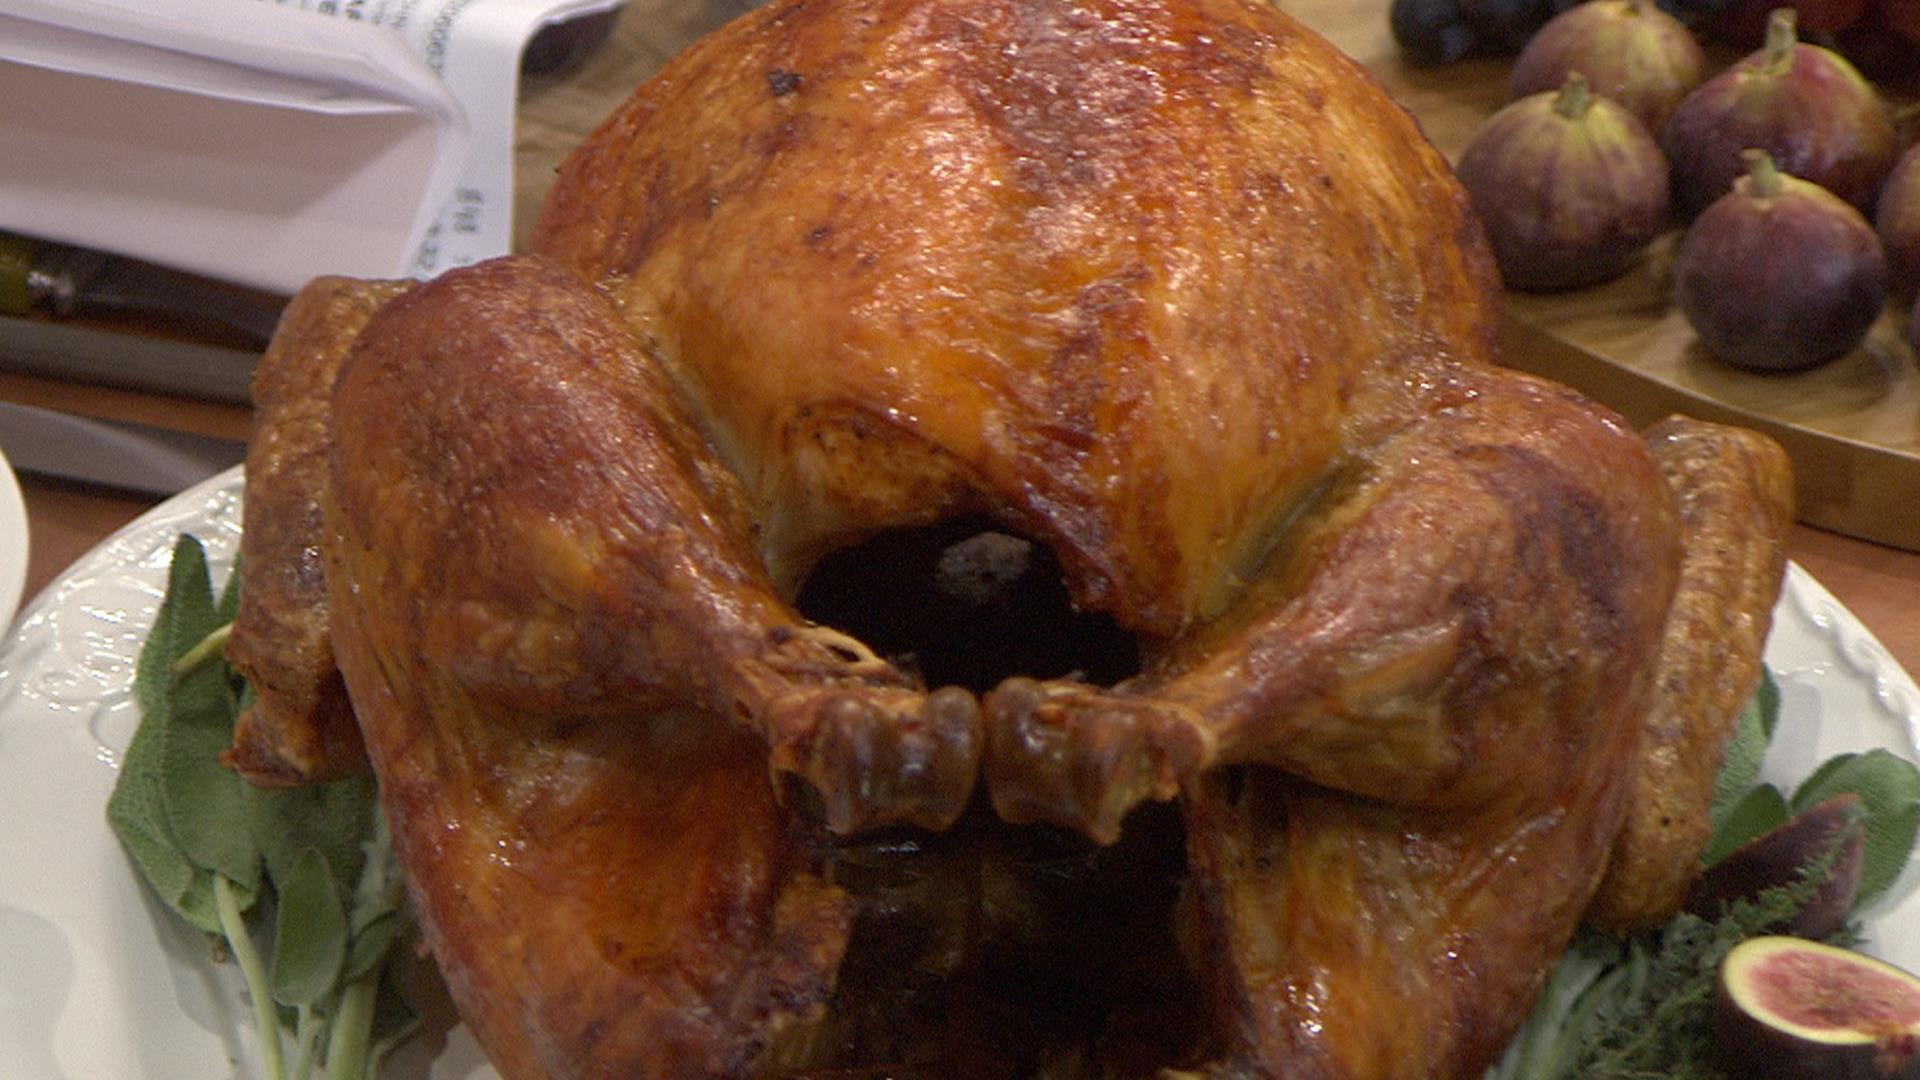 Martha Stewart Thanksgiving Turkey  Try Martha Stewart's upside down Thanksgiving turkey with